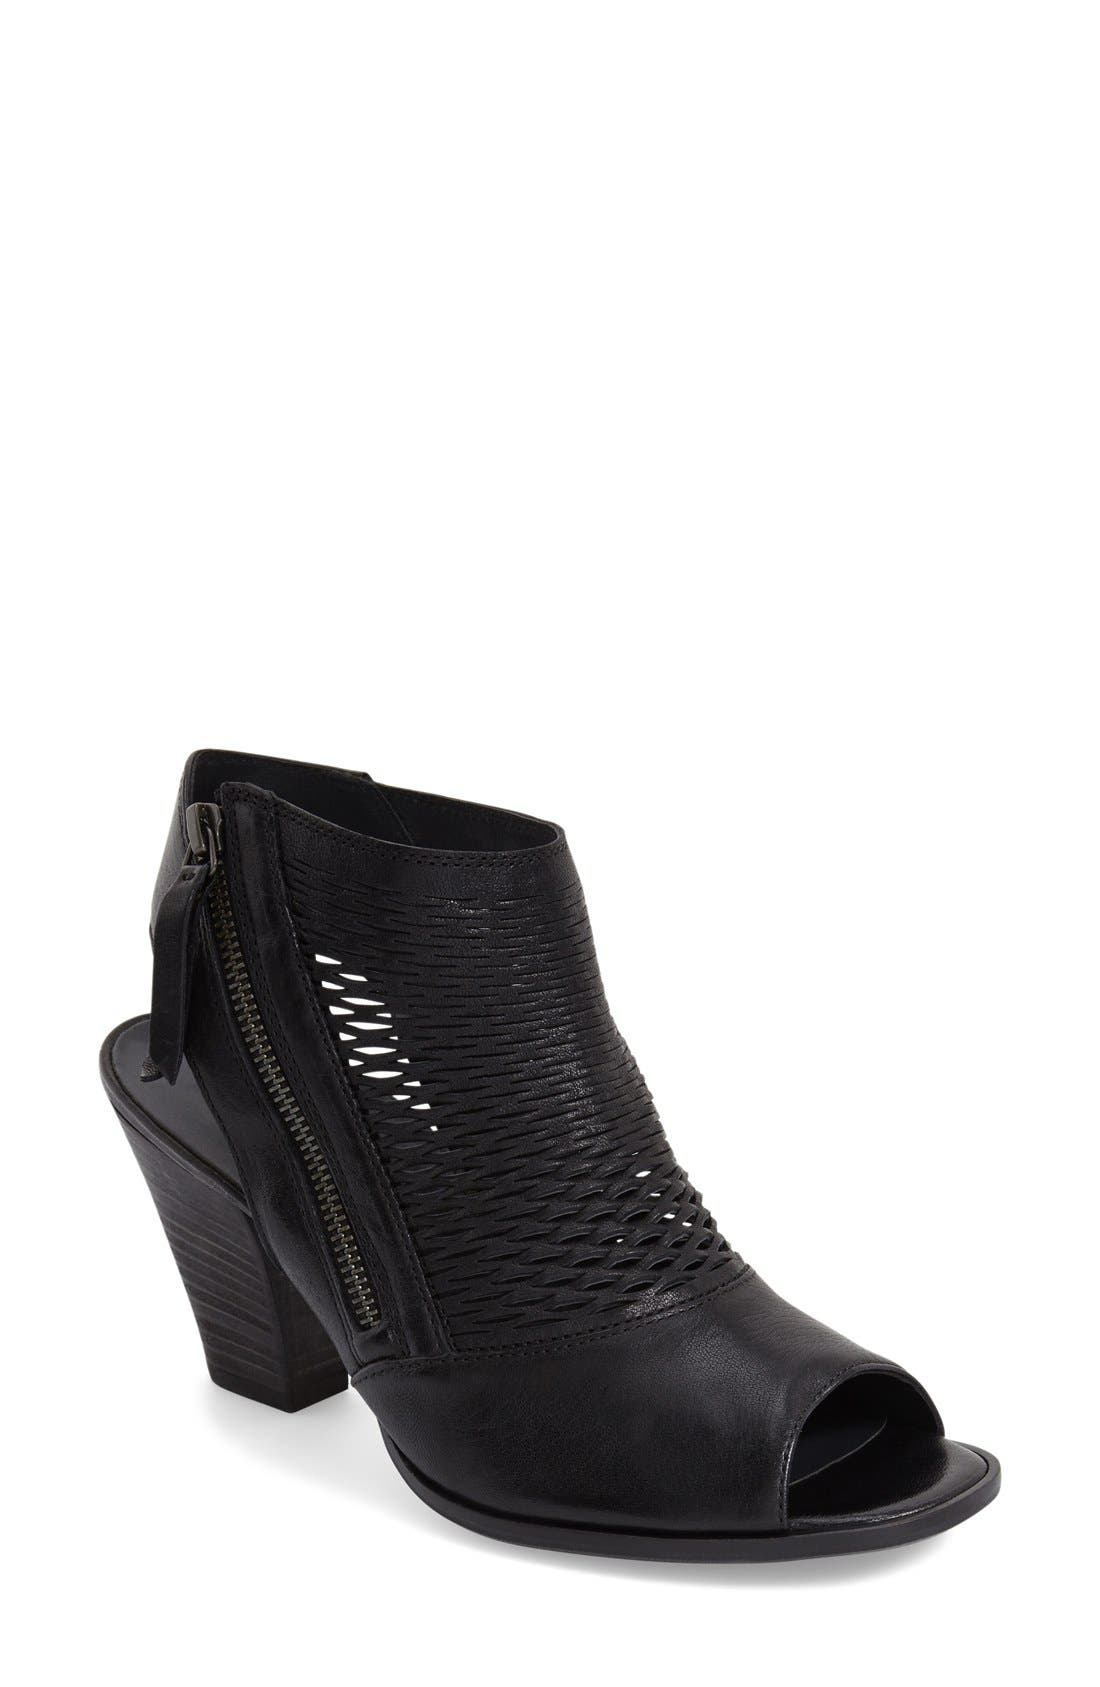 'Willow' Peep Toe Sandal,                             Main thumbnail 1, color,                             Black Leather